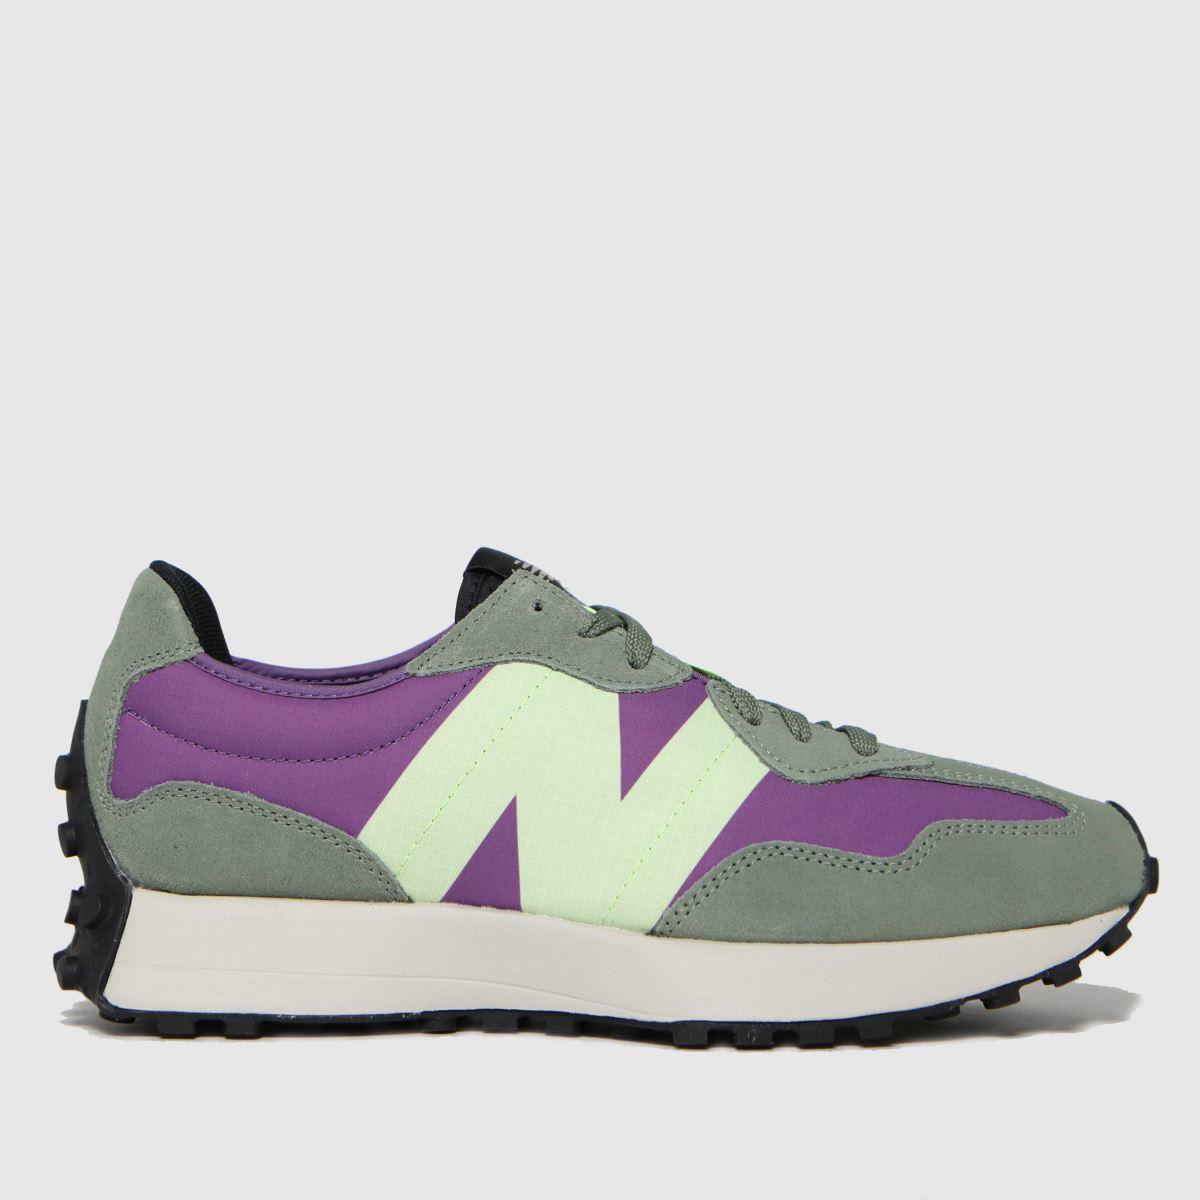 New Balance Green 327 Trainers